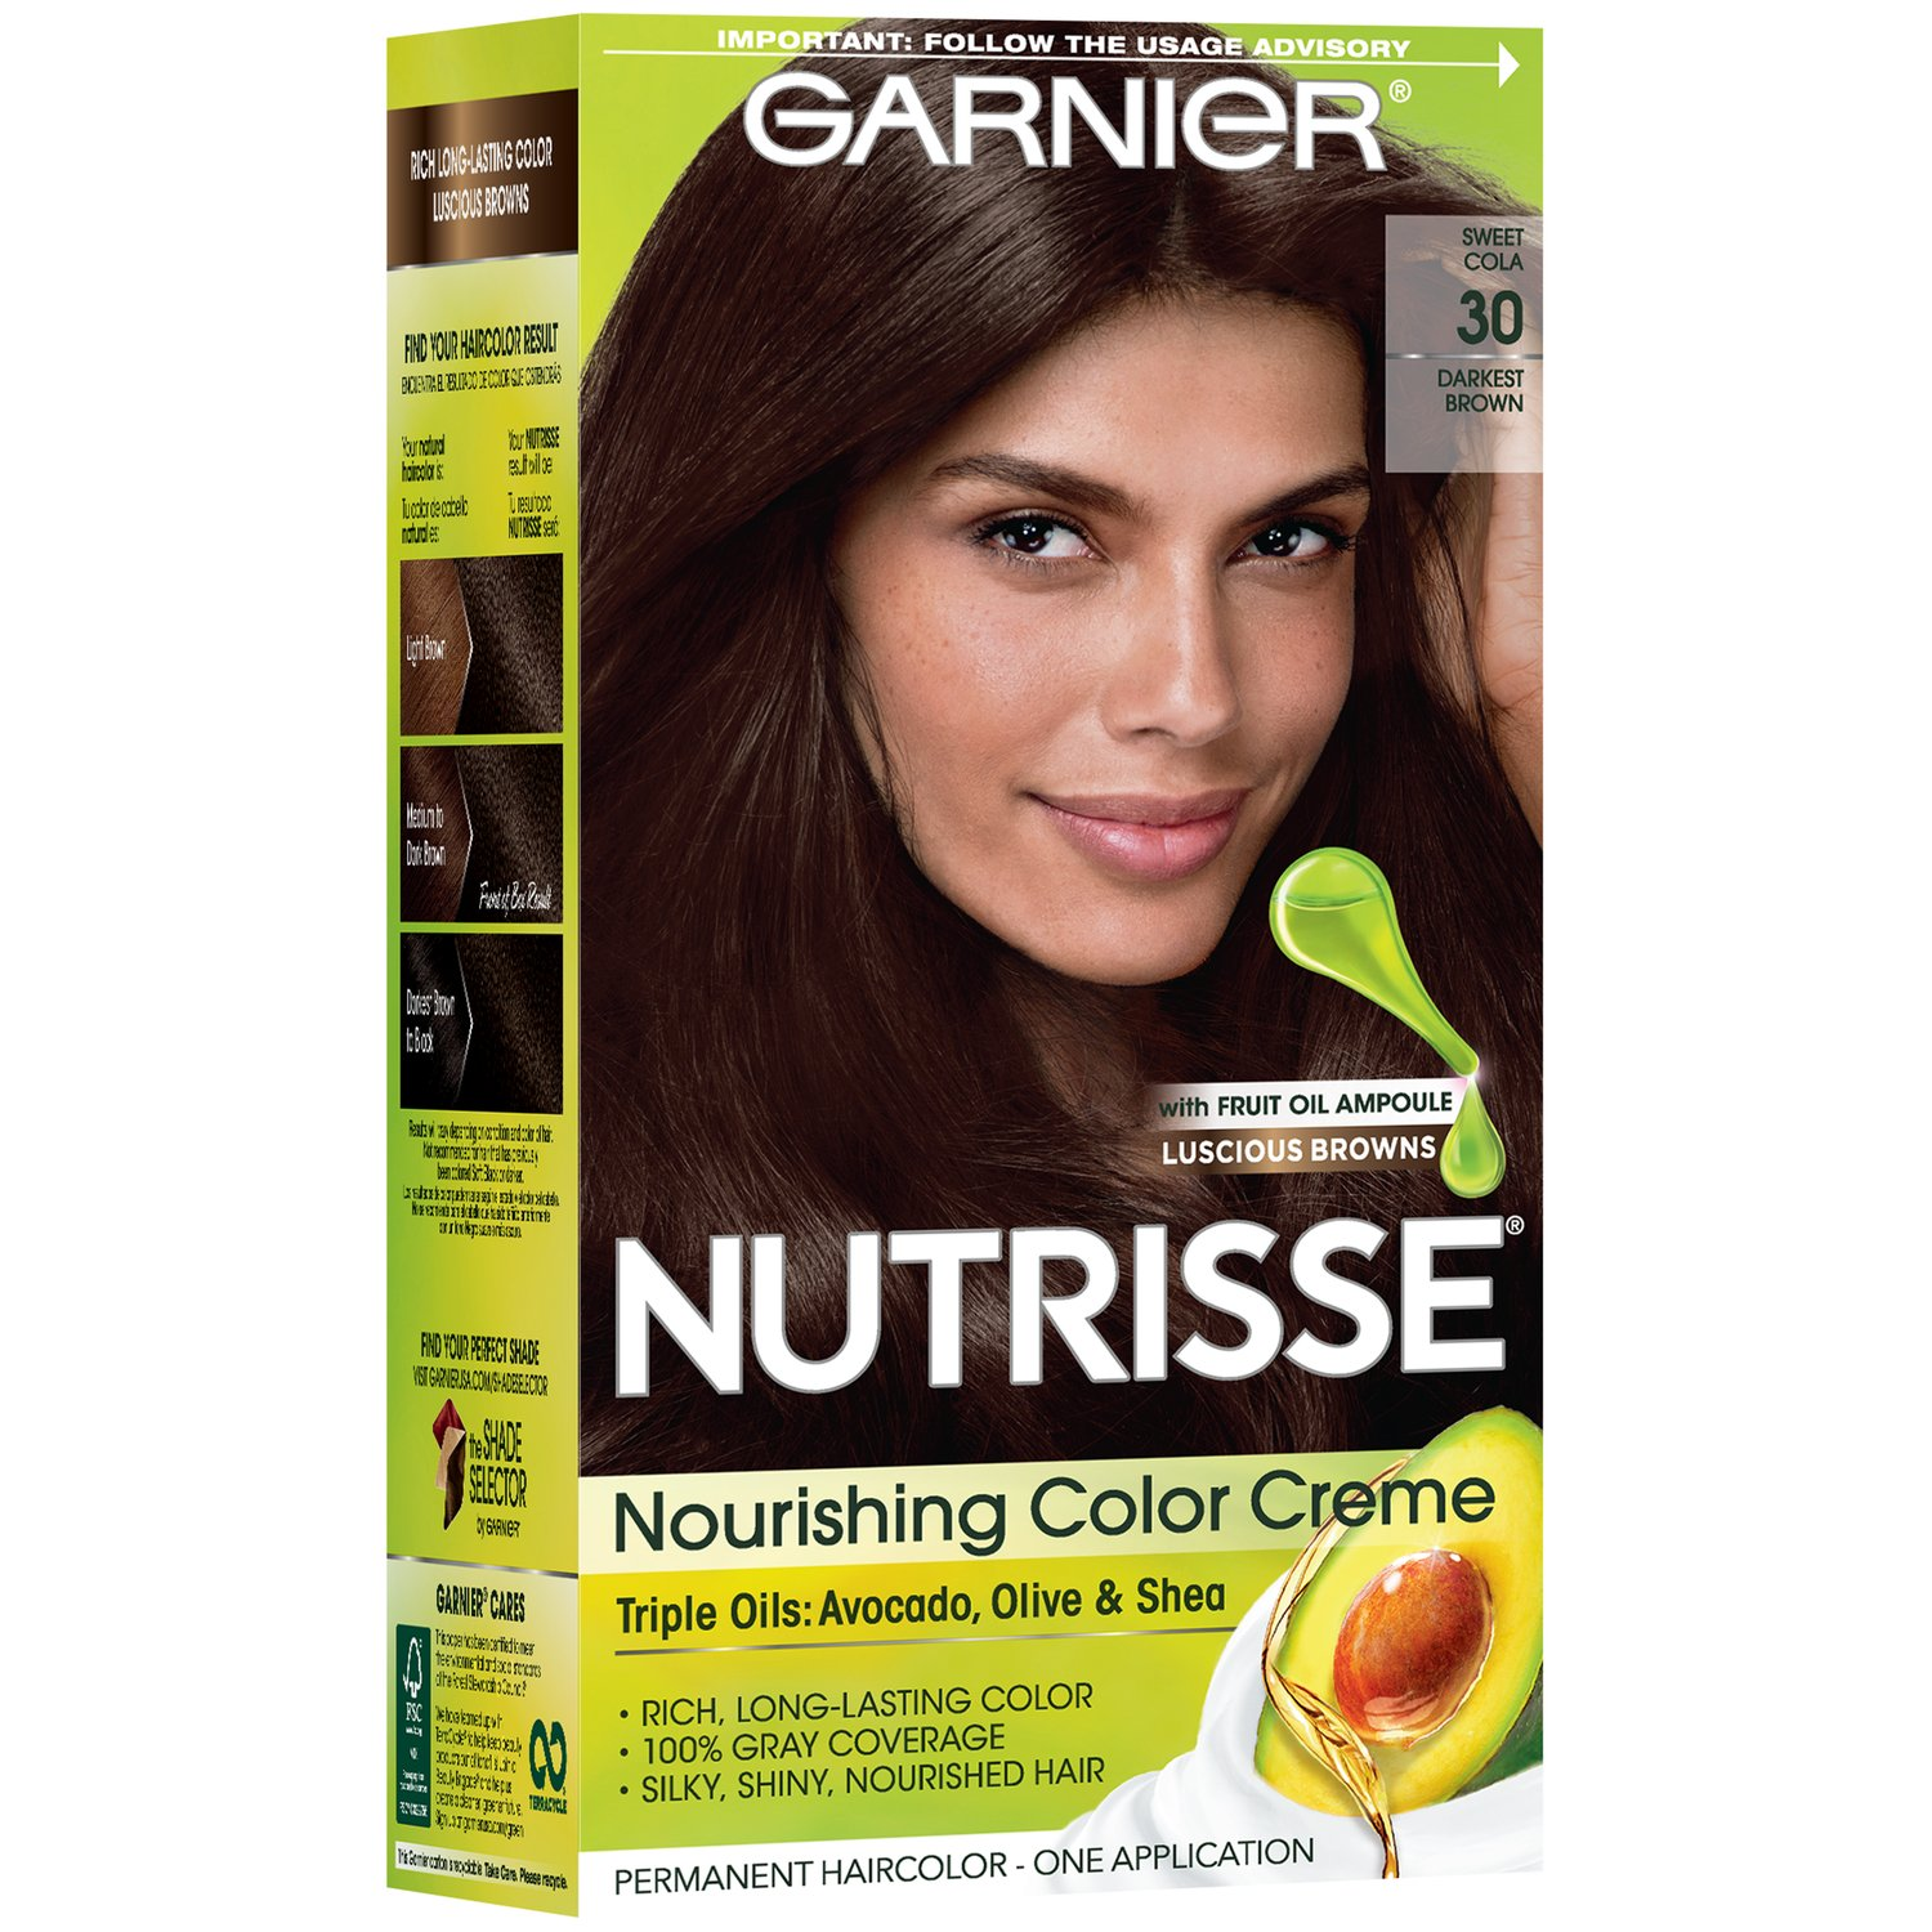 Hair color shop heb everyday low prices online garnier nutrisse nourishing color creme 30 darkest brown sweet cola nvjuhfo Image collections